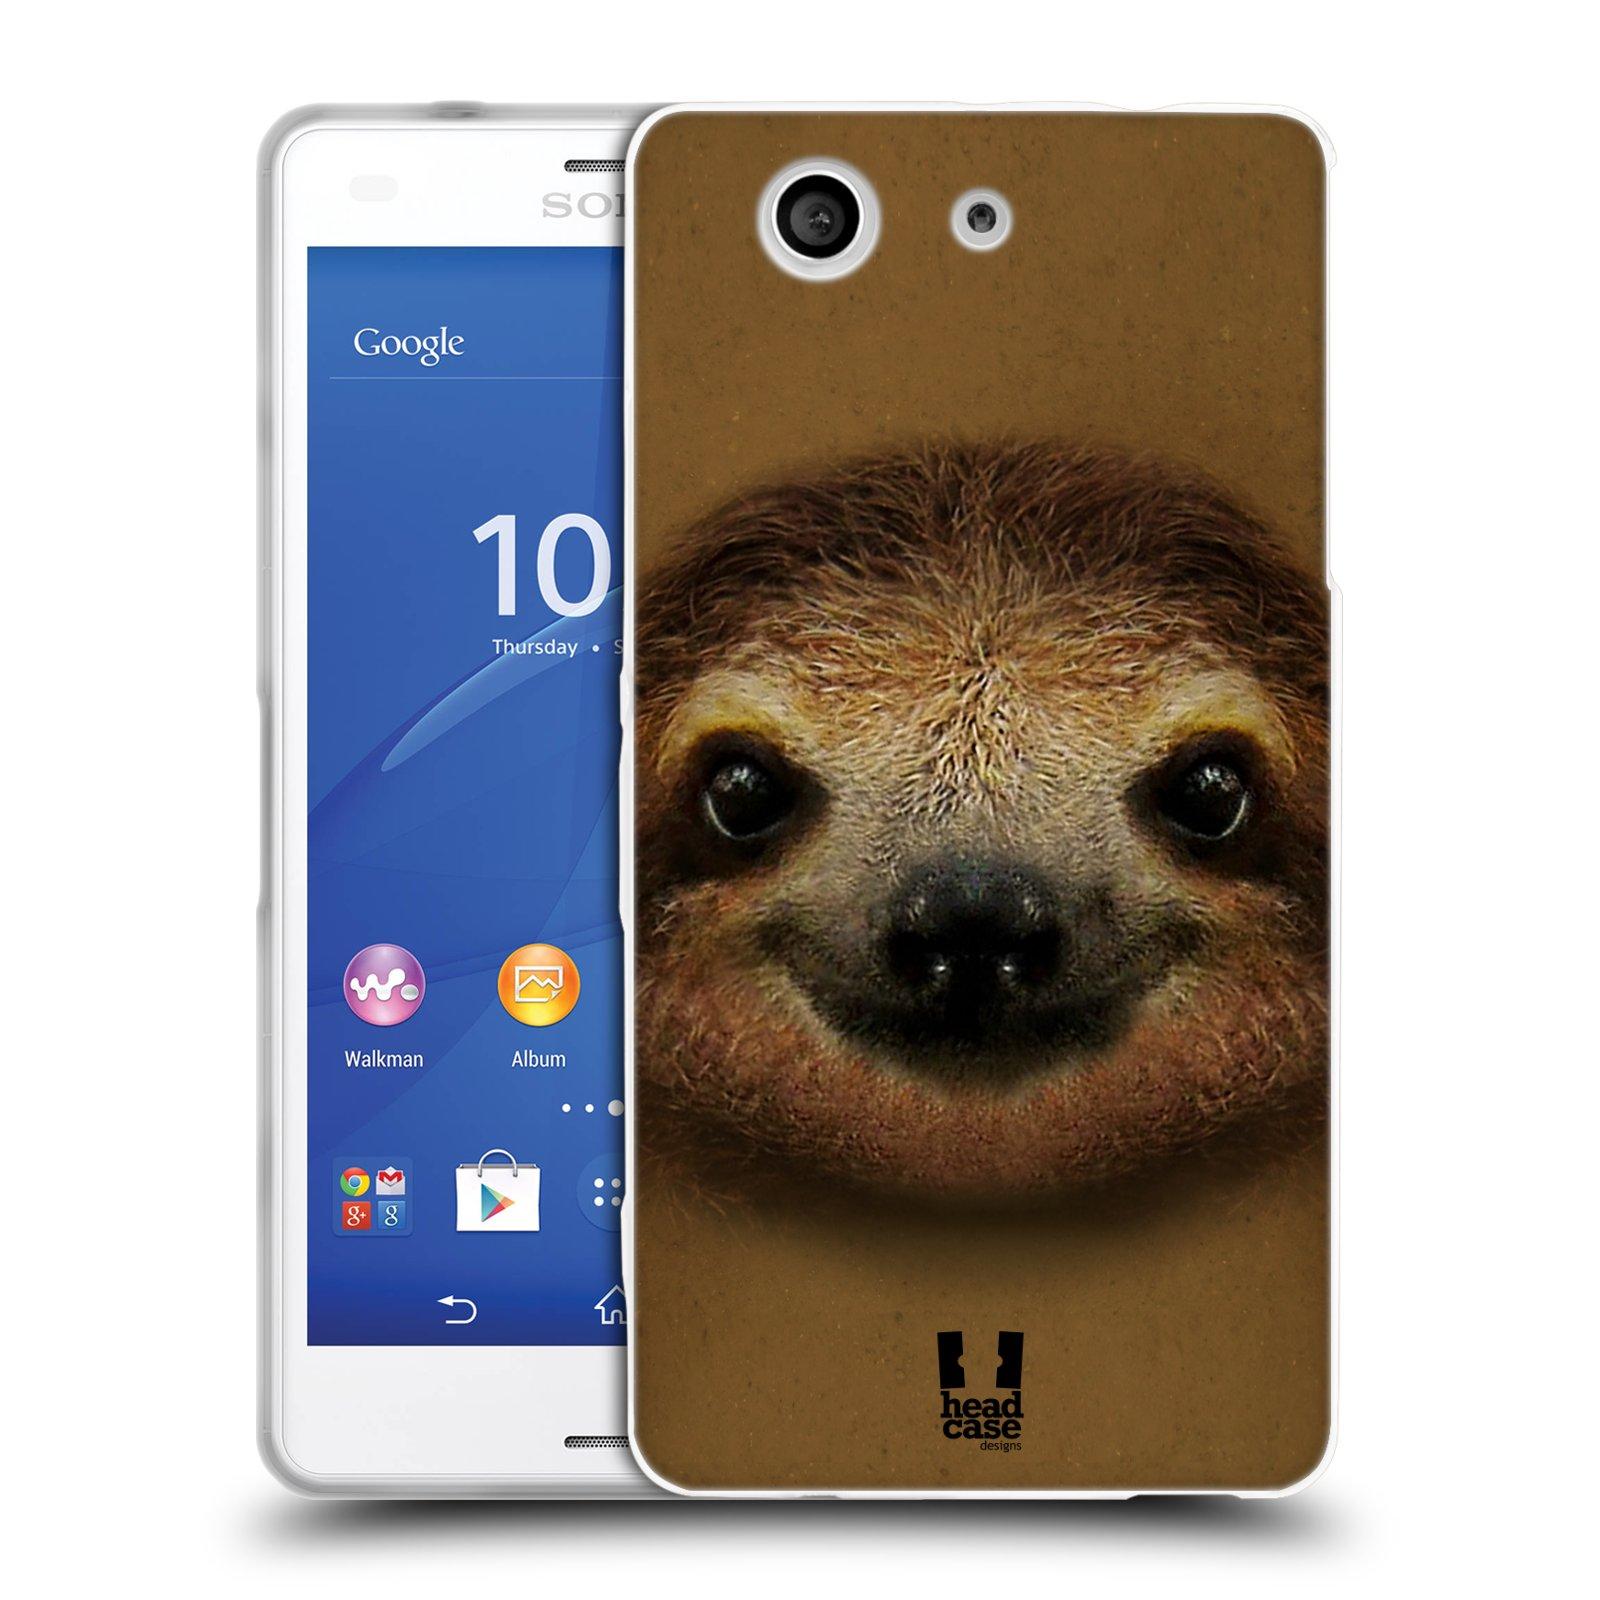 HEAD CASE silikonový obal na mobil Sony Xperia Z3 COMPACT (D5803) vzor Zvířecí tváře 2 lenochod